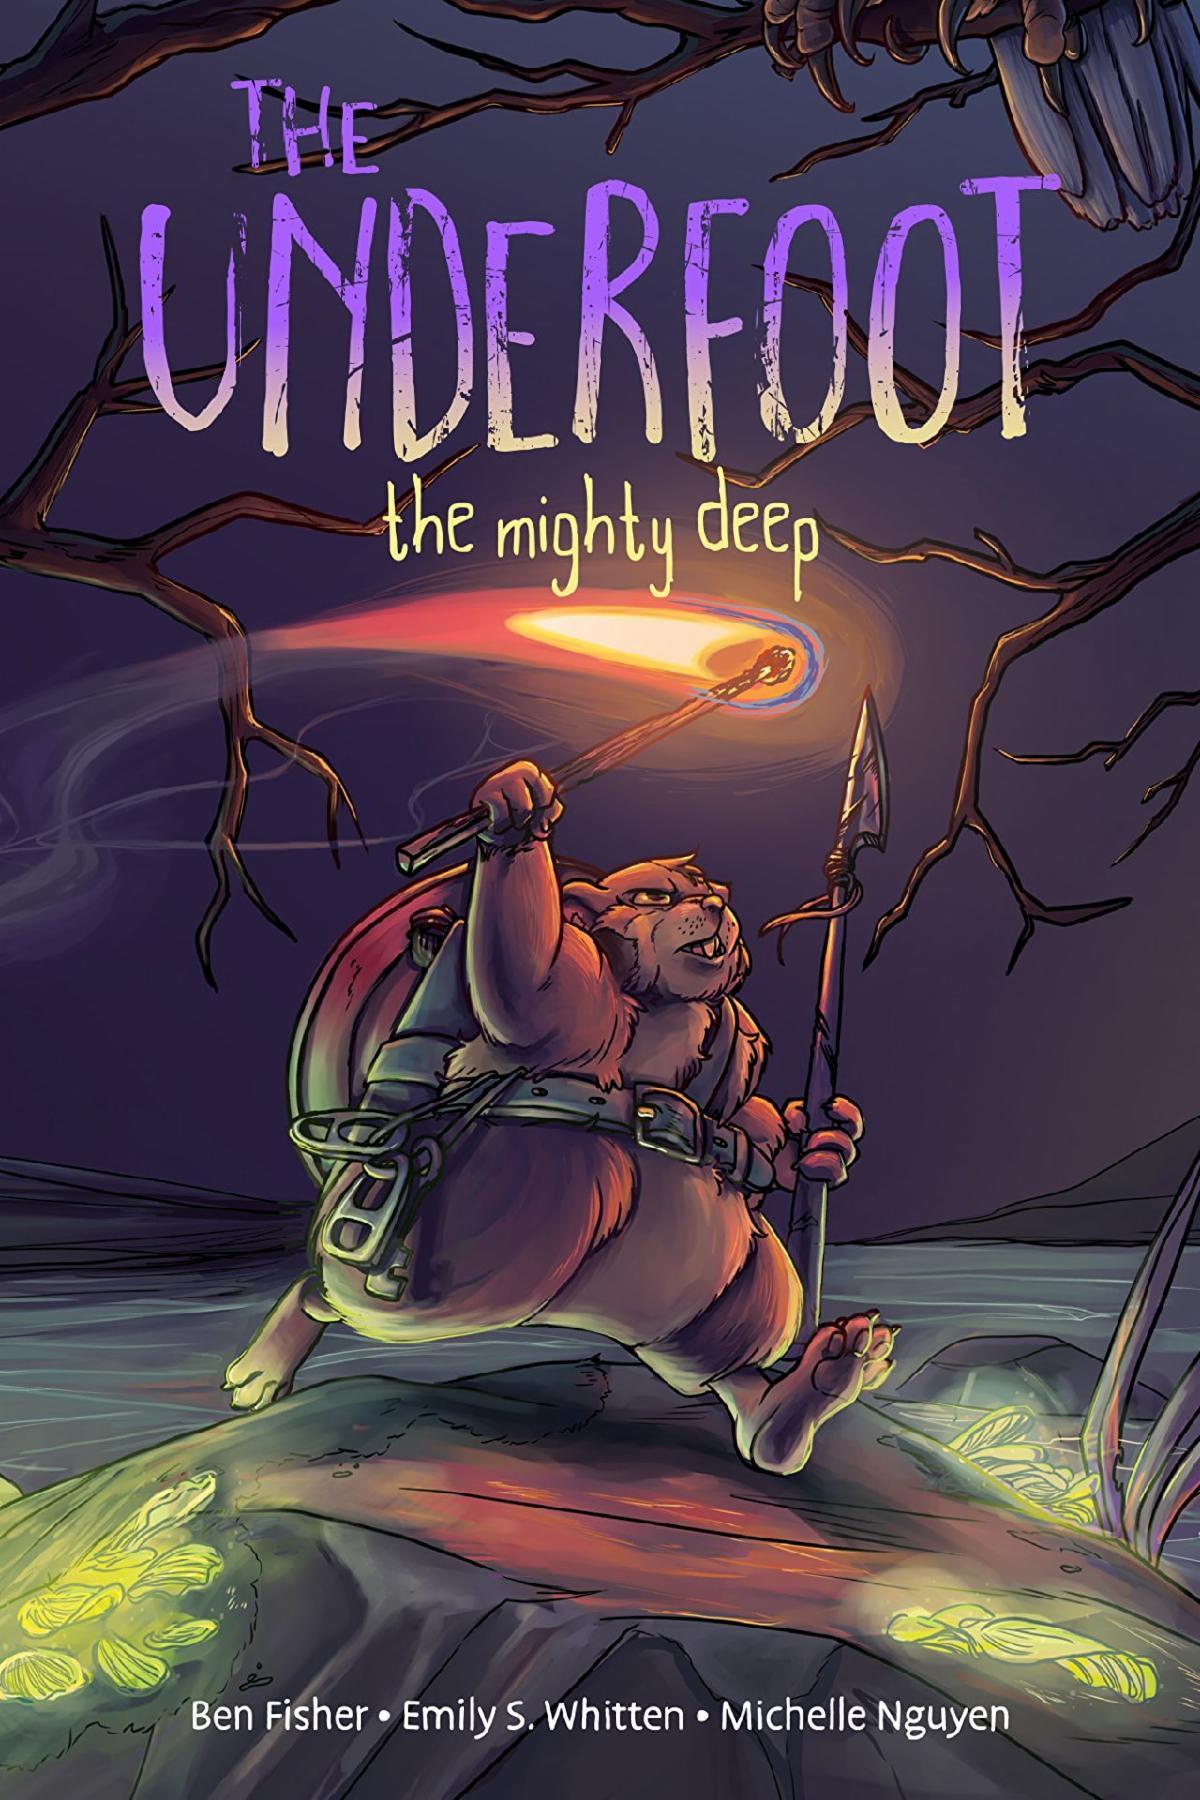 The Underfoot b y Emily S. Whitten